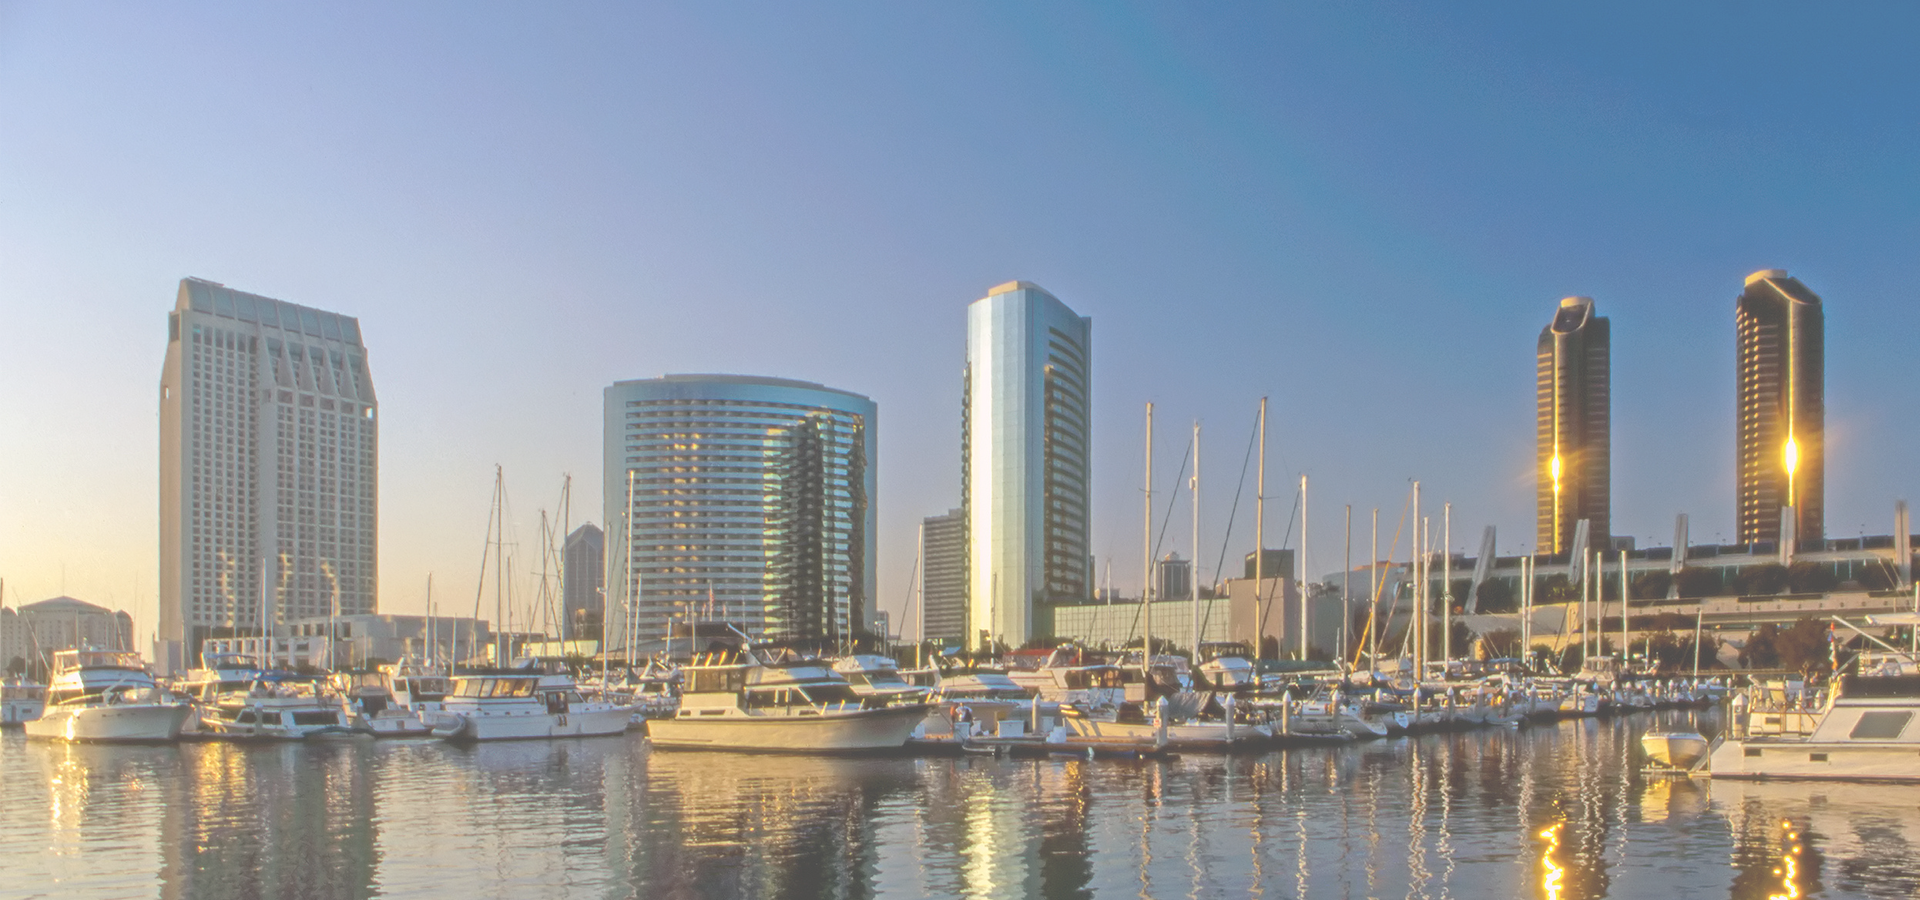 <b>San Diego, California, USA</b>